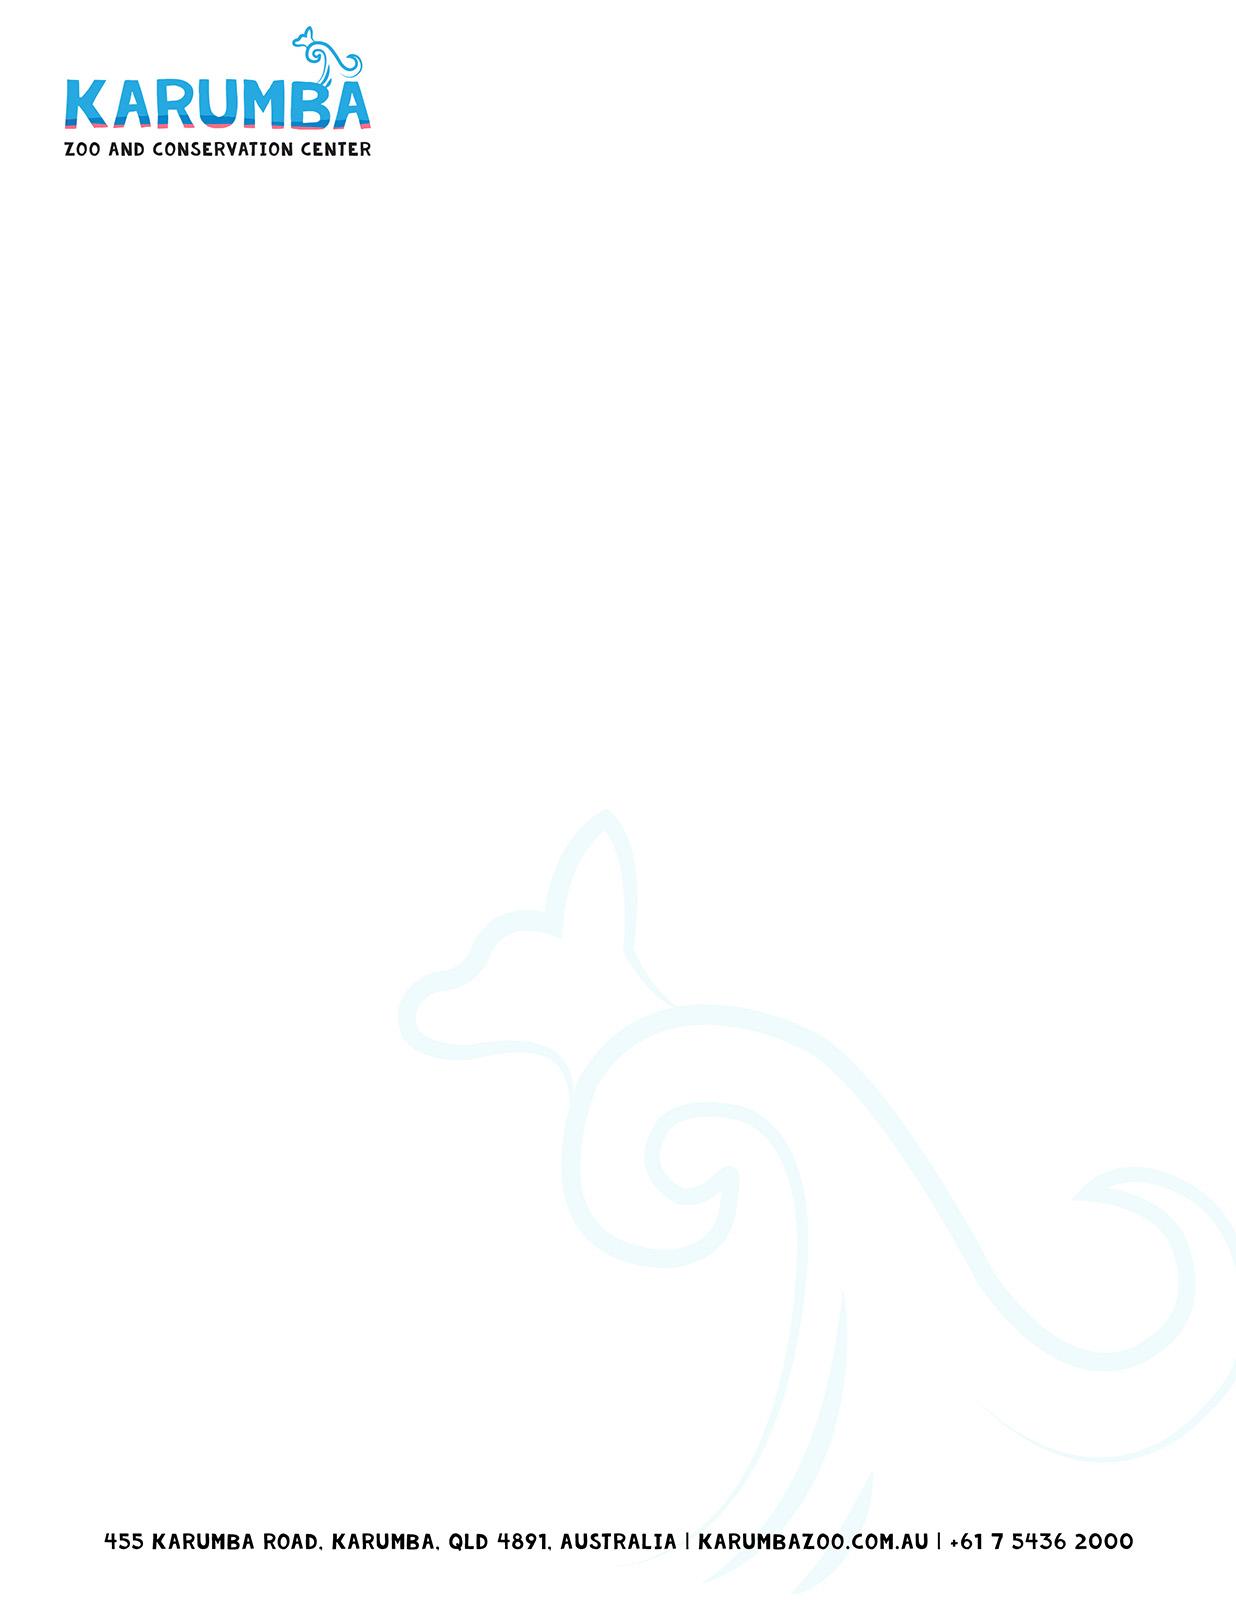 letterhead_done